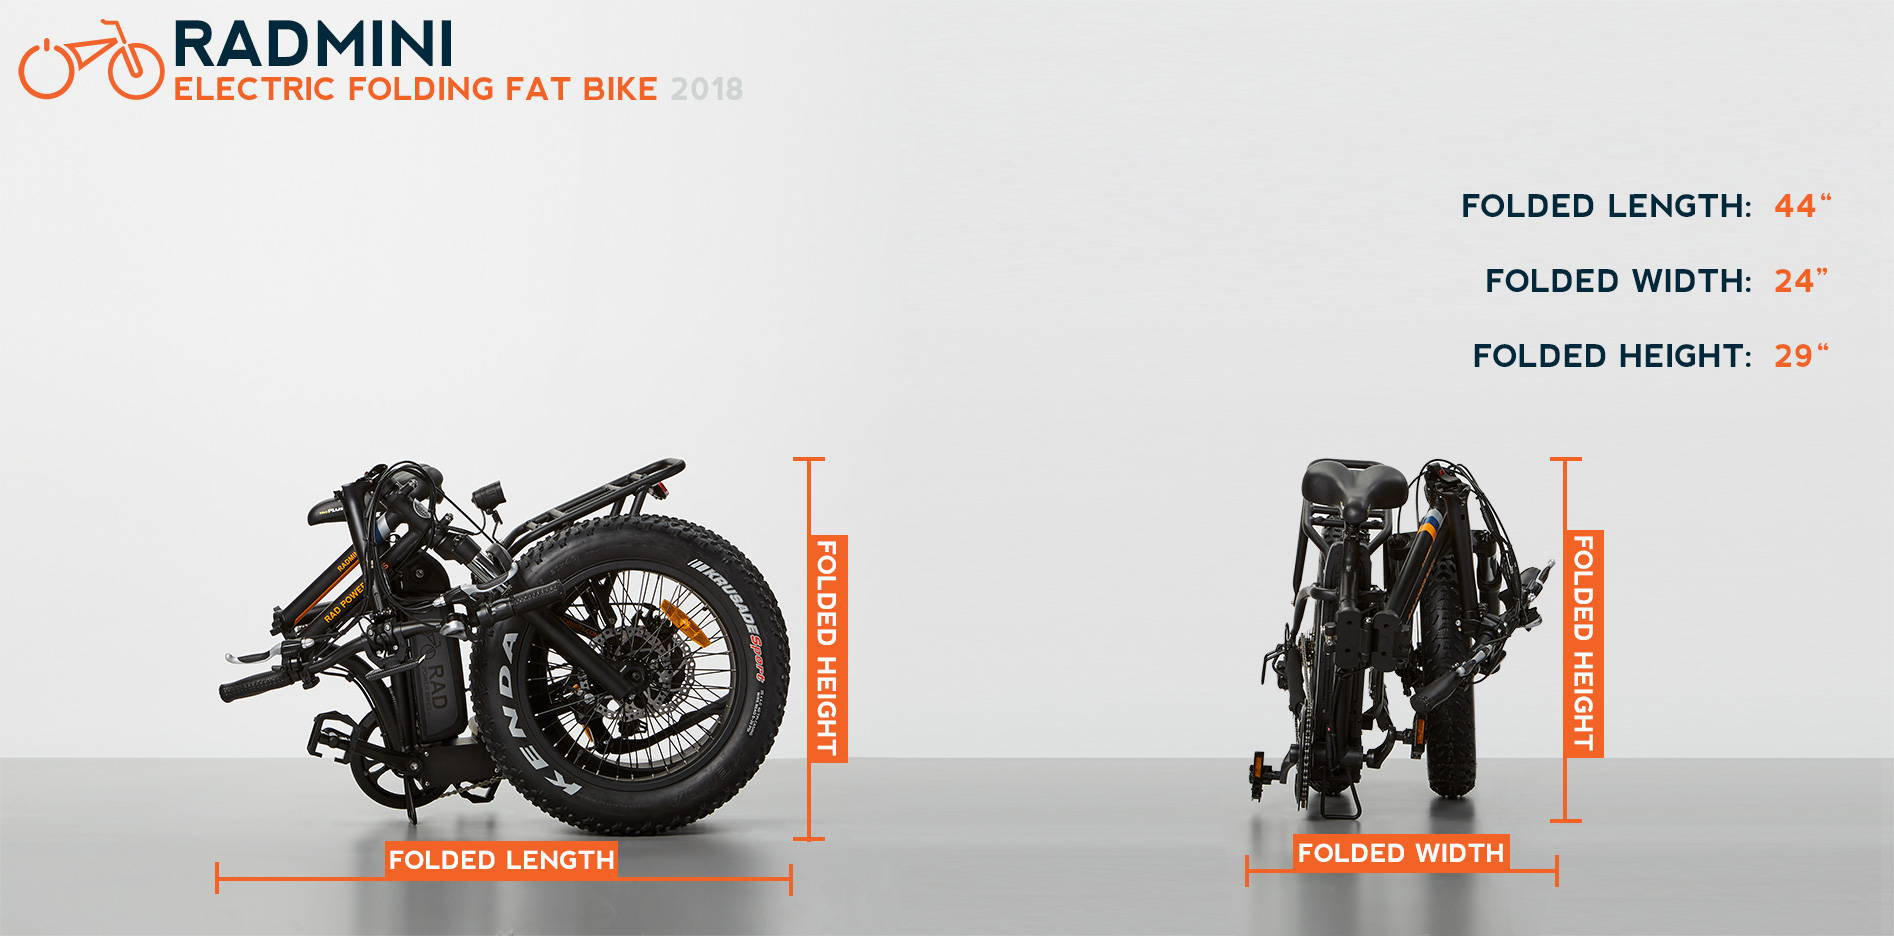 Radmini Electric Folding Fat Bike Rad Power Bikes Pocket Wiring Charging Port Free Image About Diagram And Sizing Chart